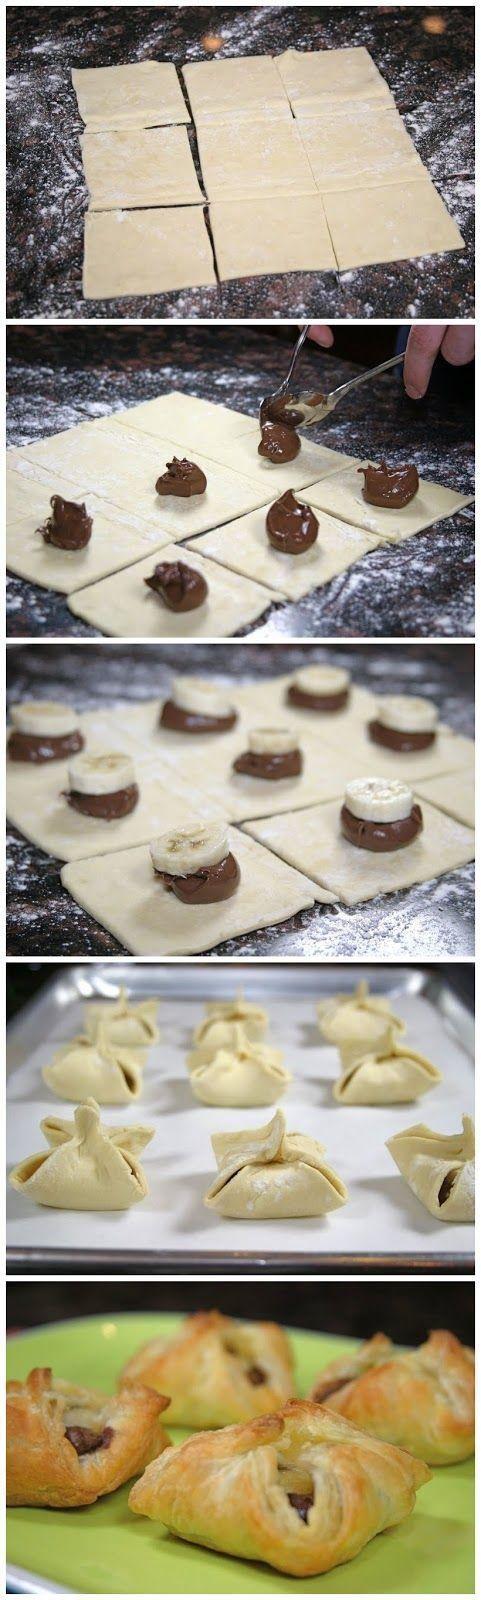 Nutella and Banana Pastry Purses.